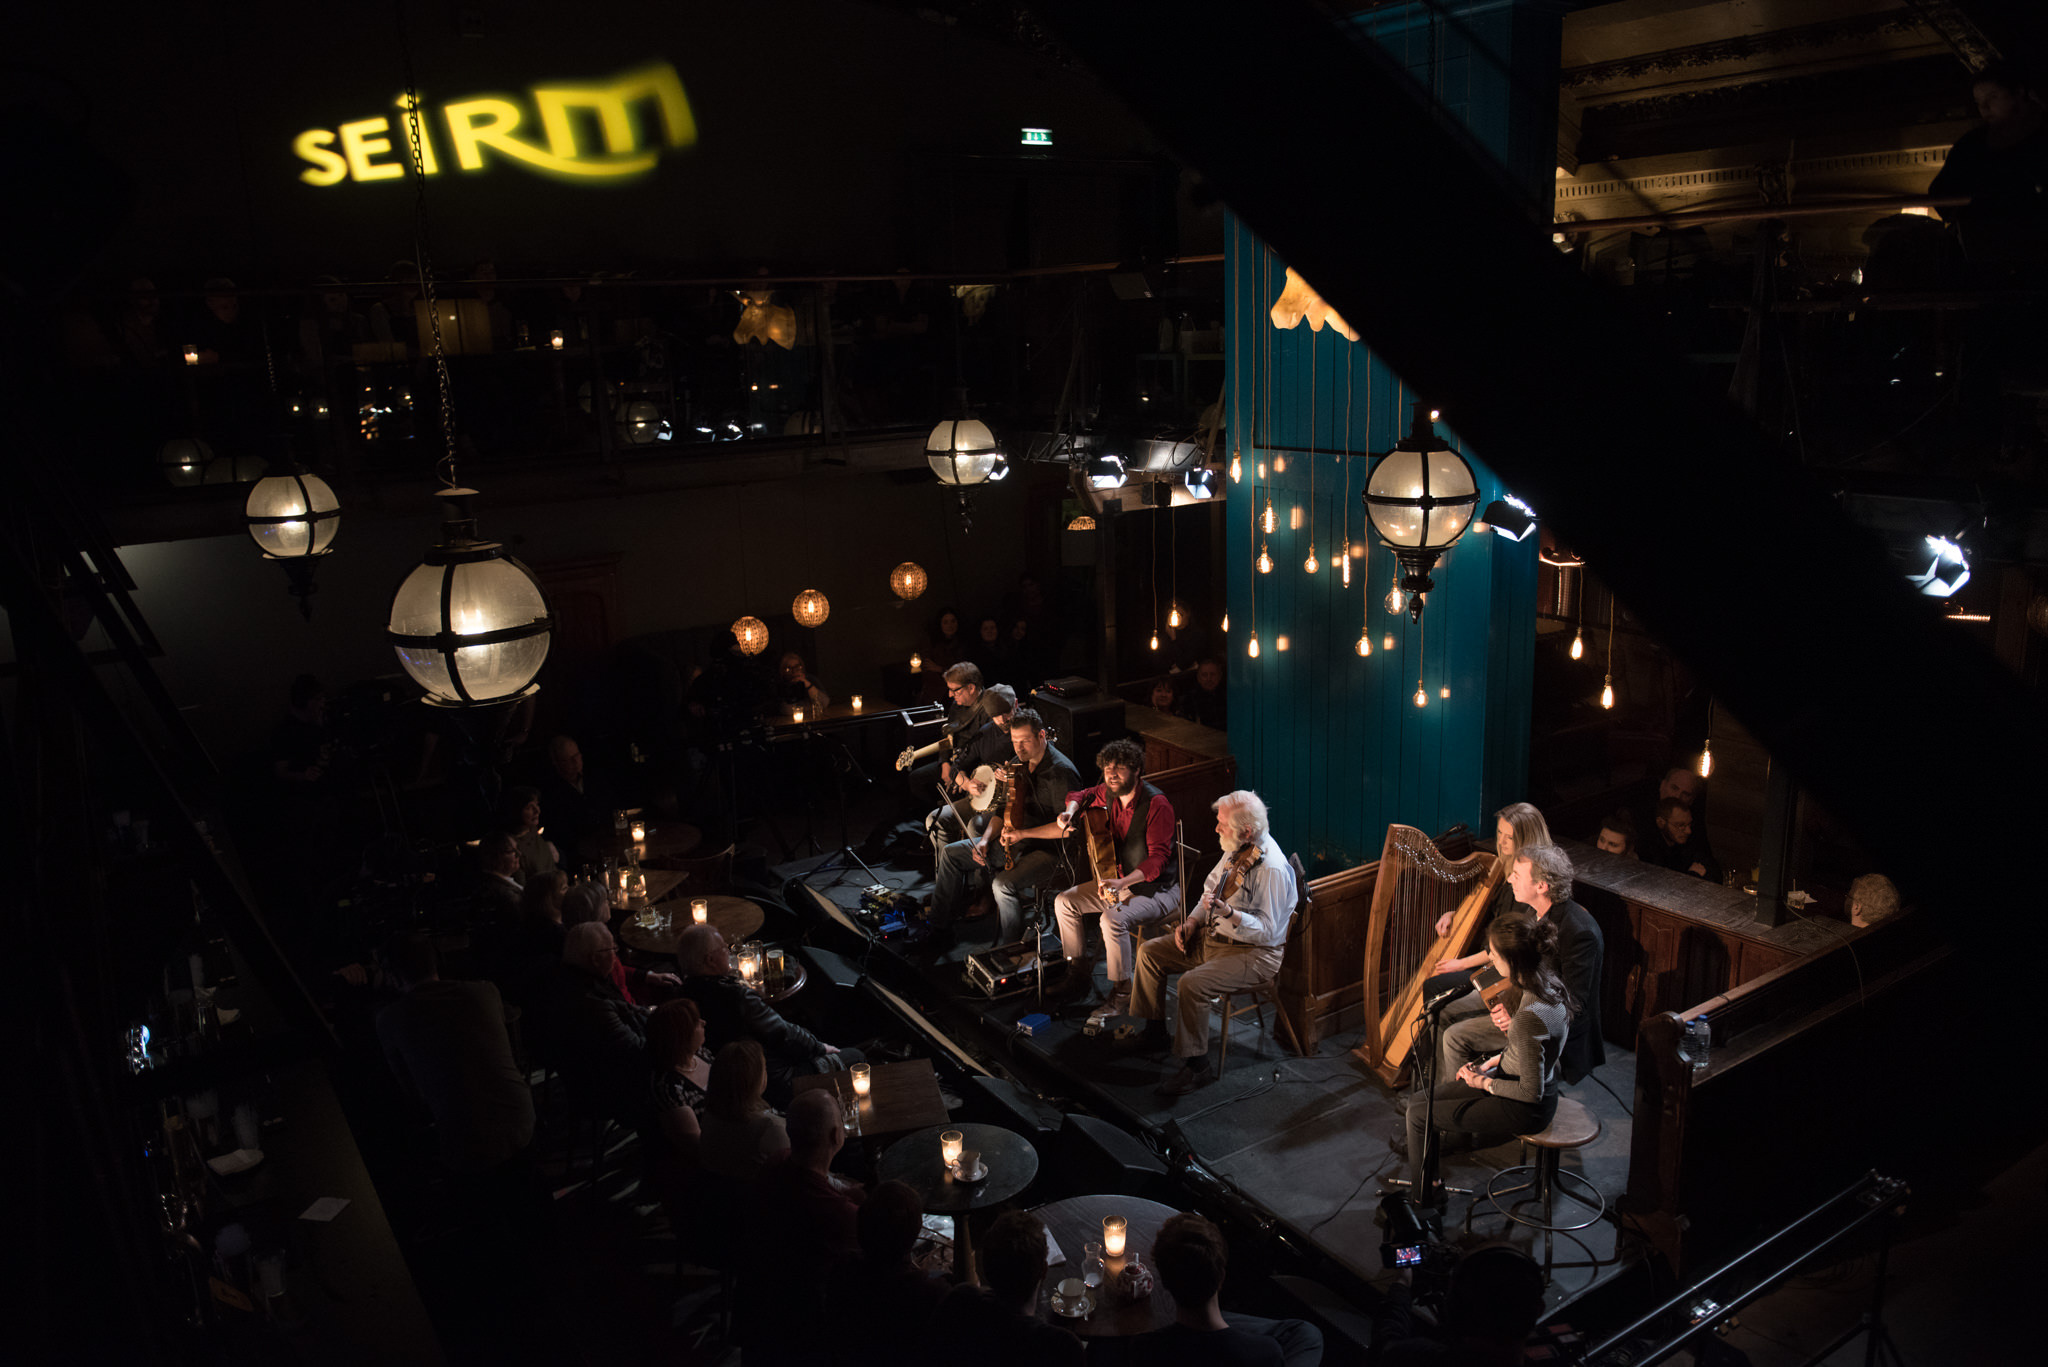 seirm-tv-bbc-alba-music-recording-hillhead-bookclub-glasgow.jpg